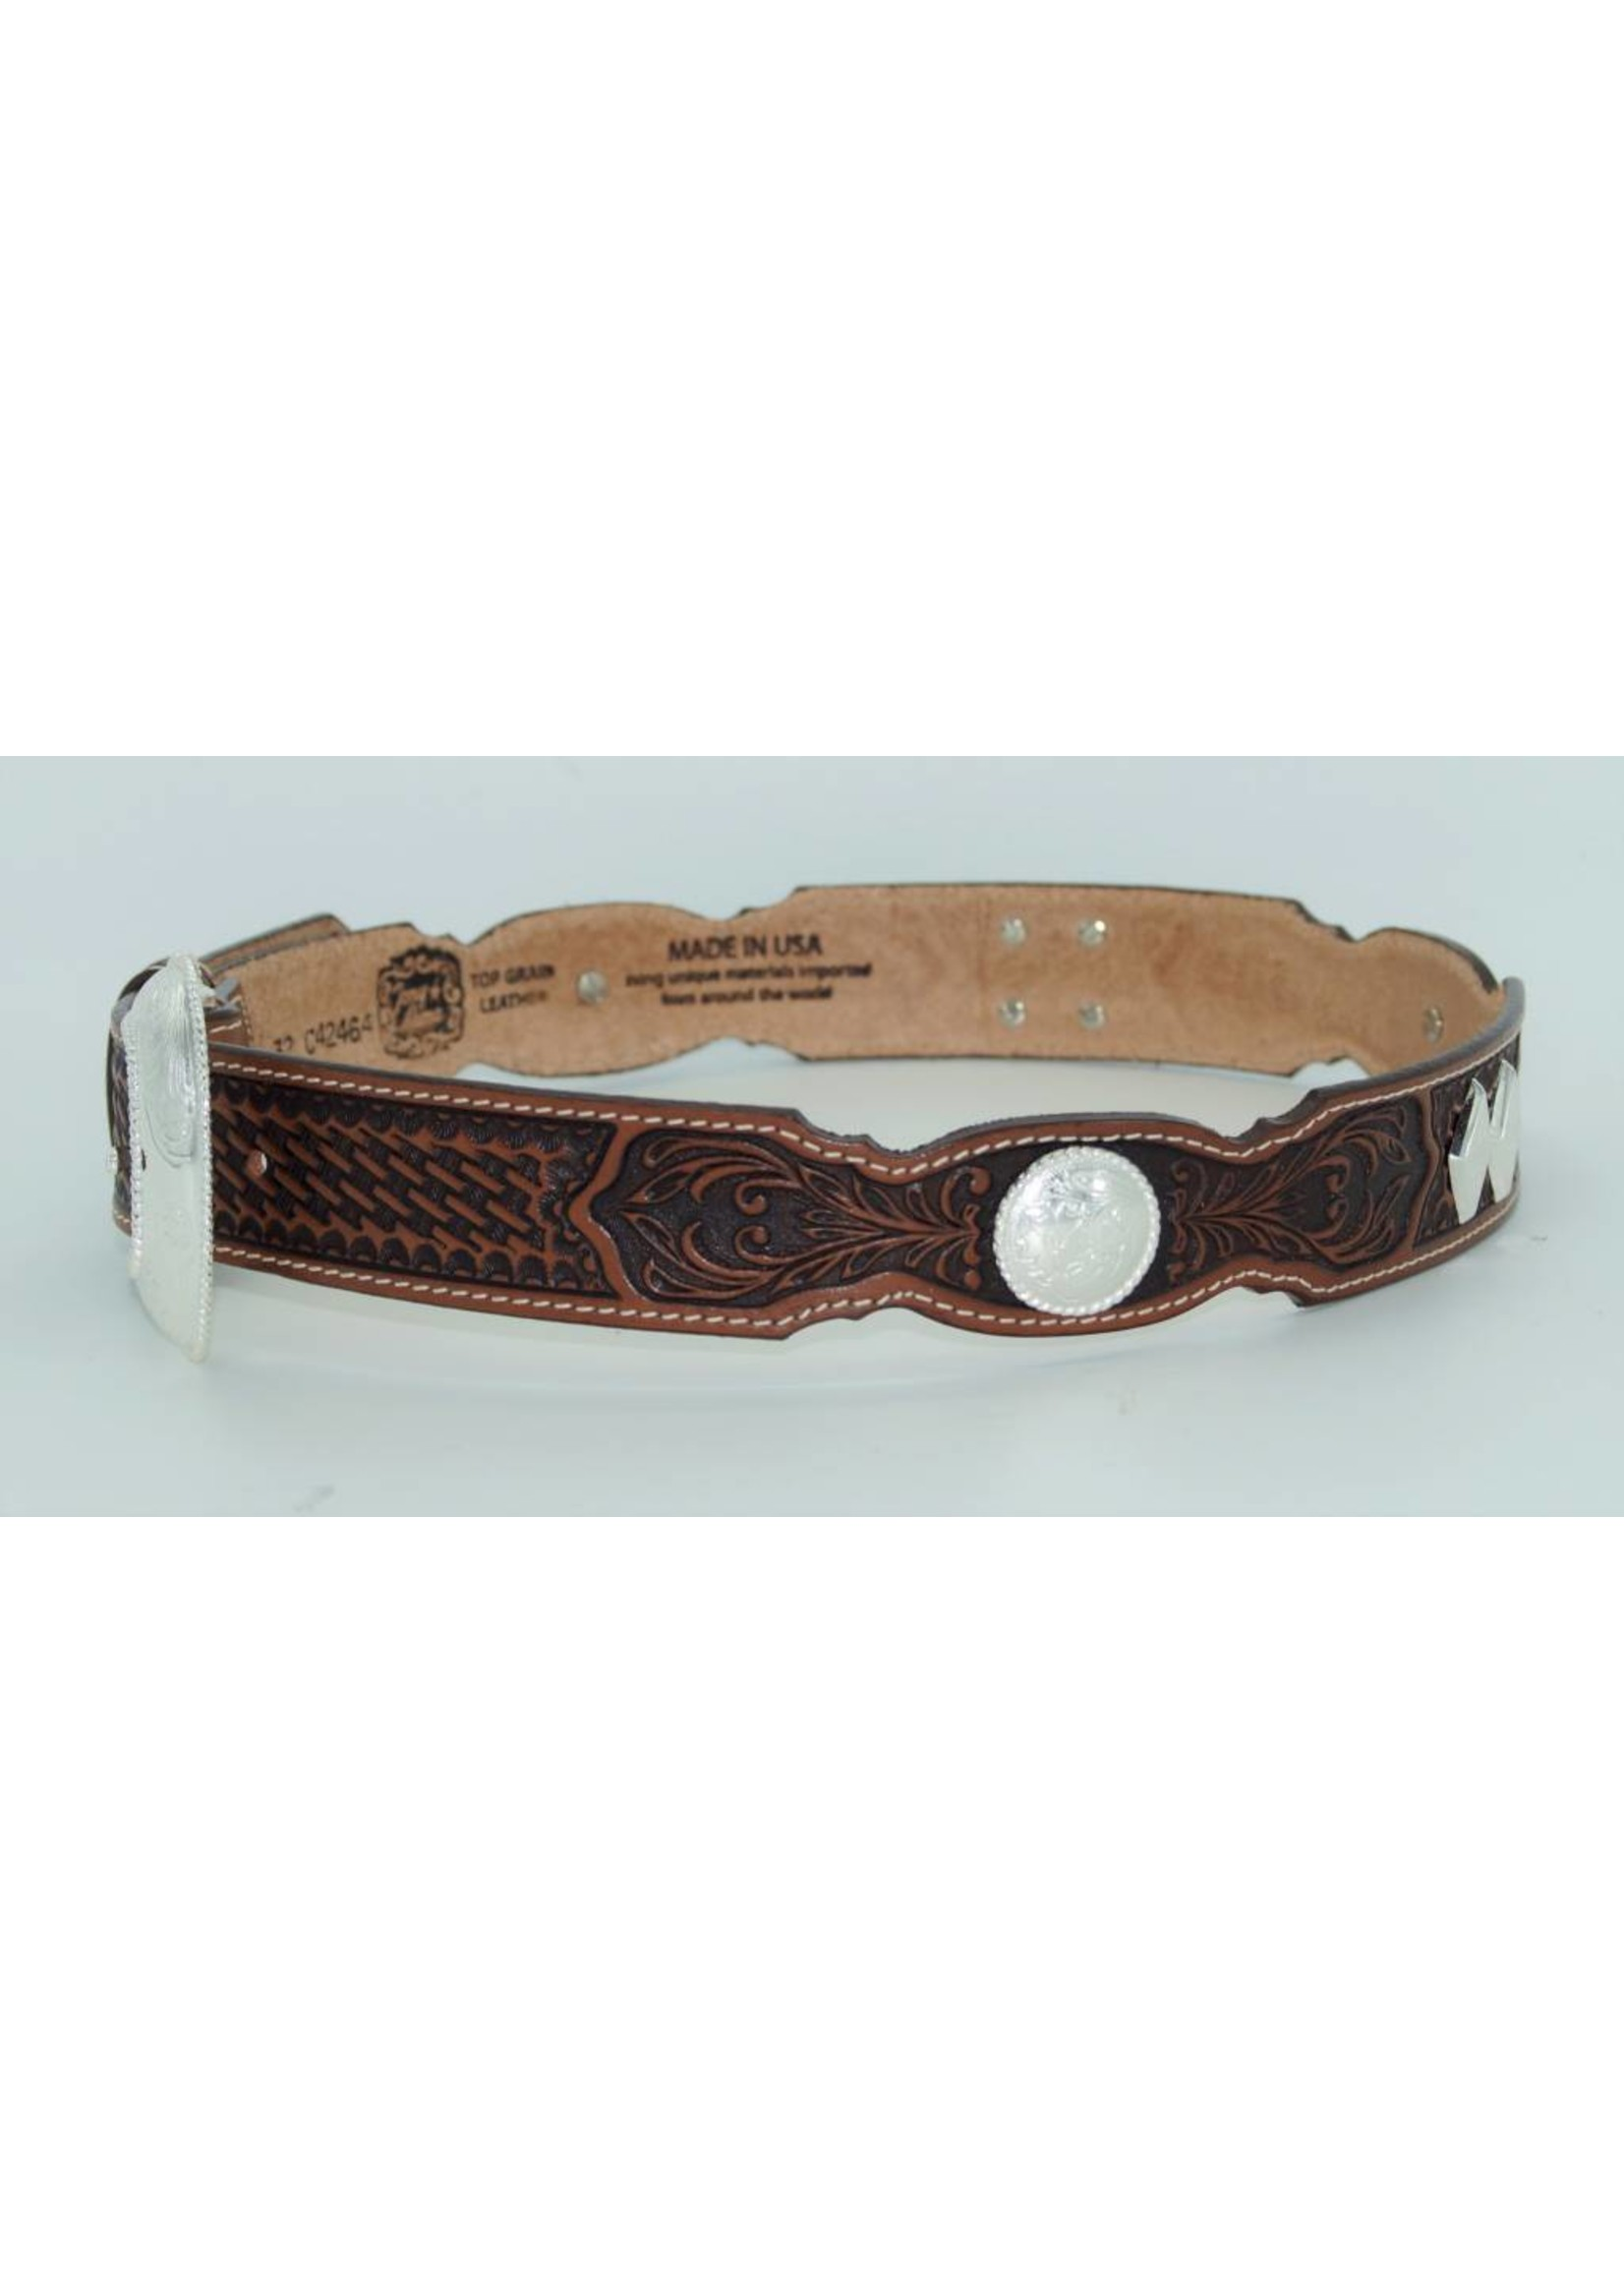 Tony Lama Tony Lama® Men's Brown Tooled Stillwater Creek Leather Belt C42464